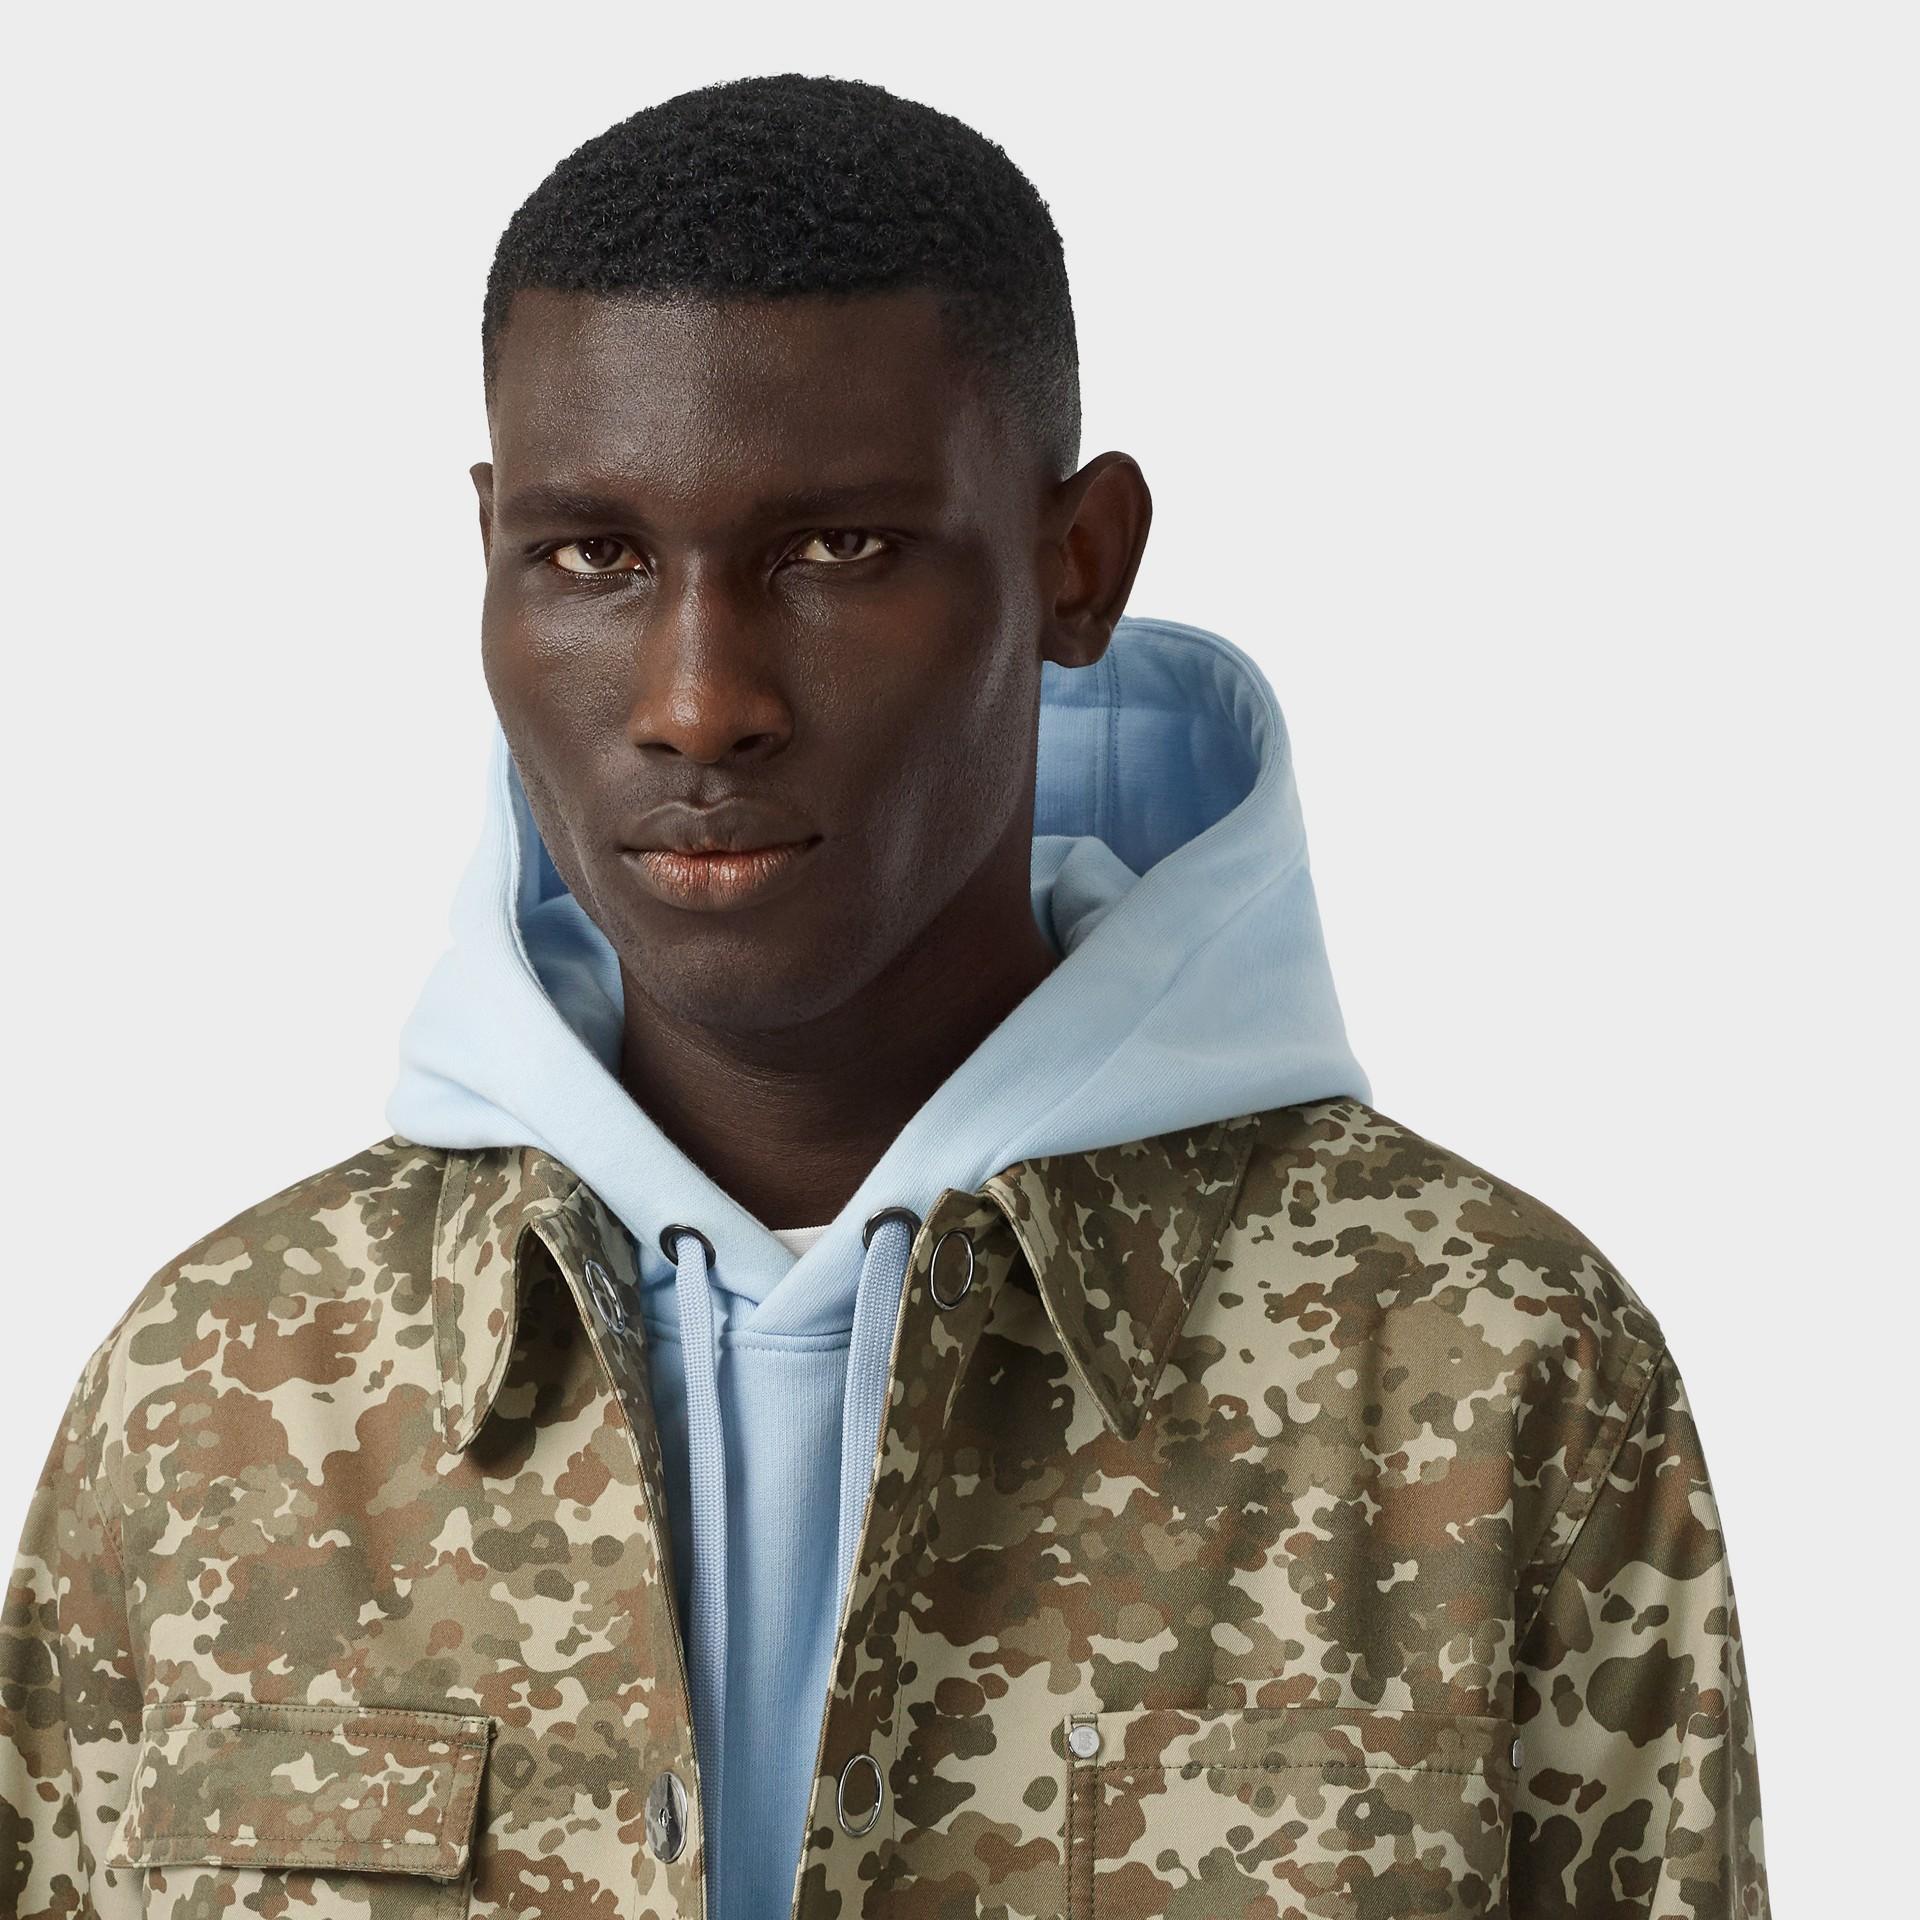 Camouflage Print Cotton Gabardine Jacket in Khaki Green - Men | Burberry United Kingdom - gallery image 2